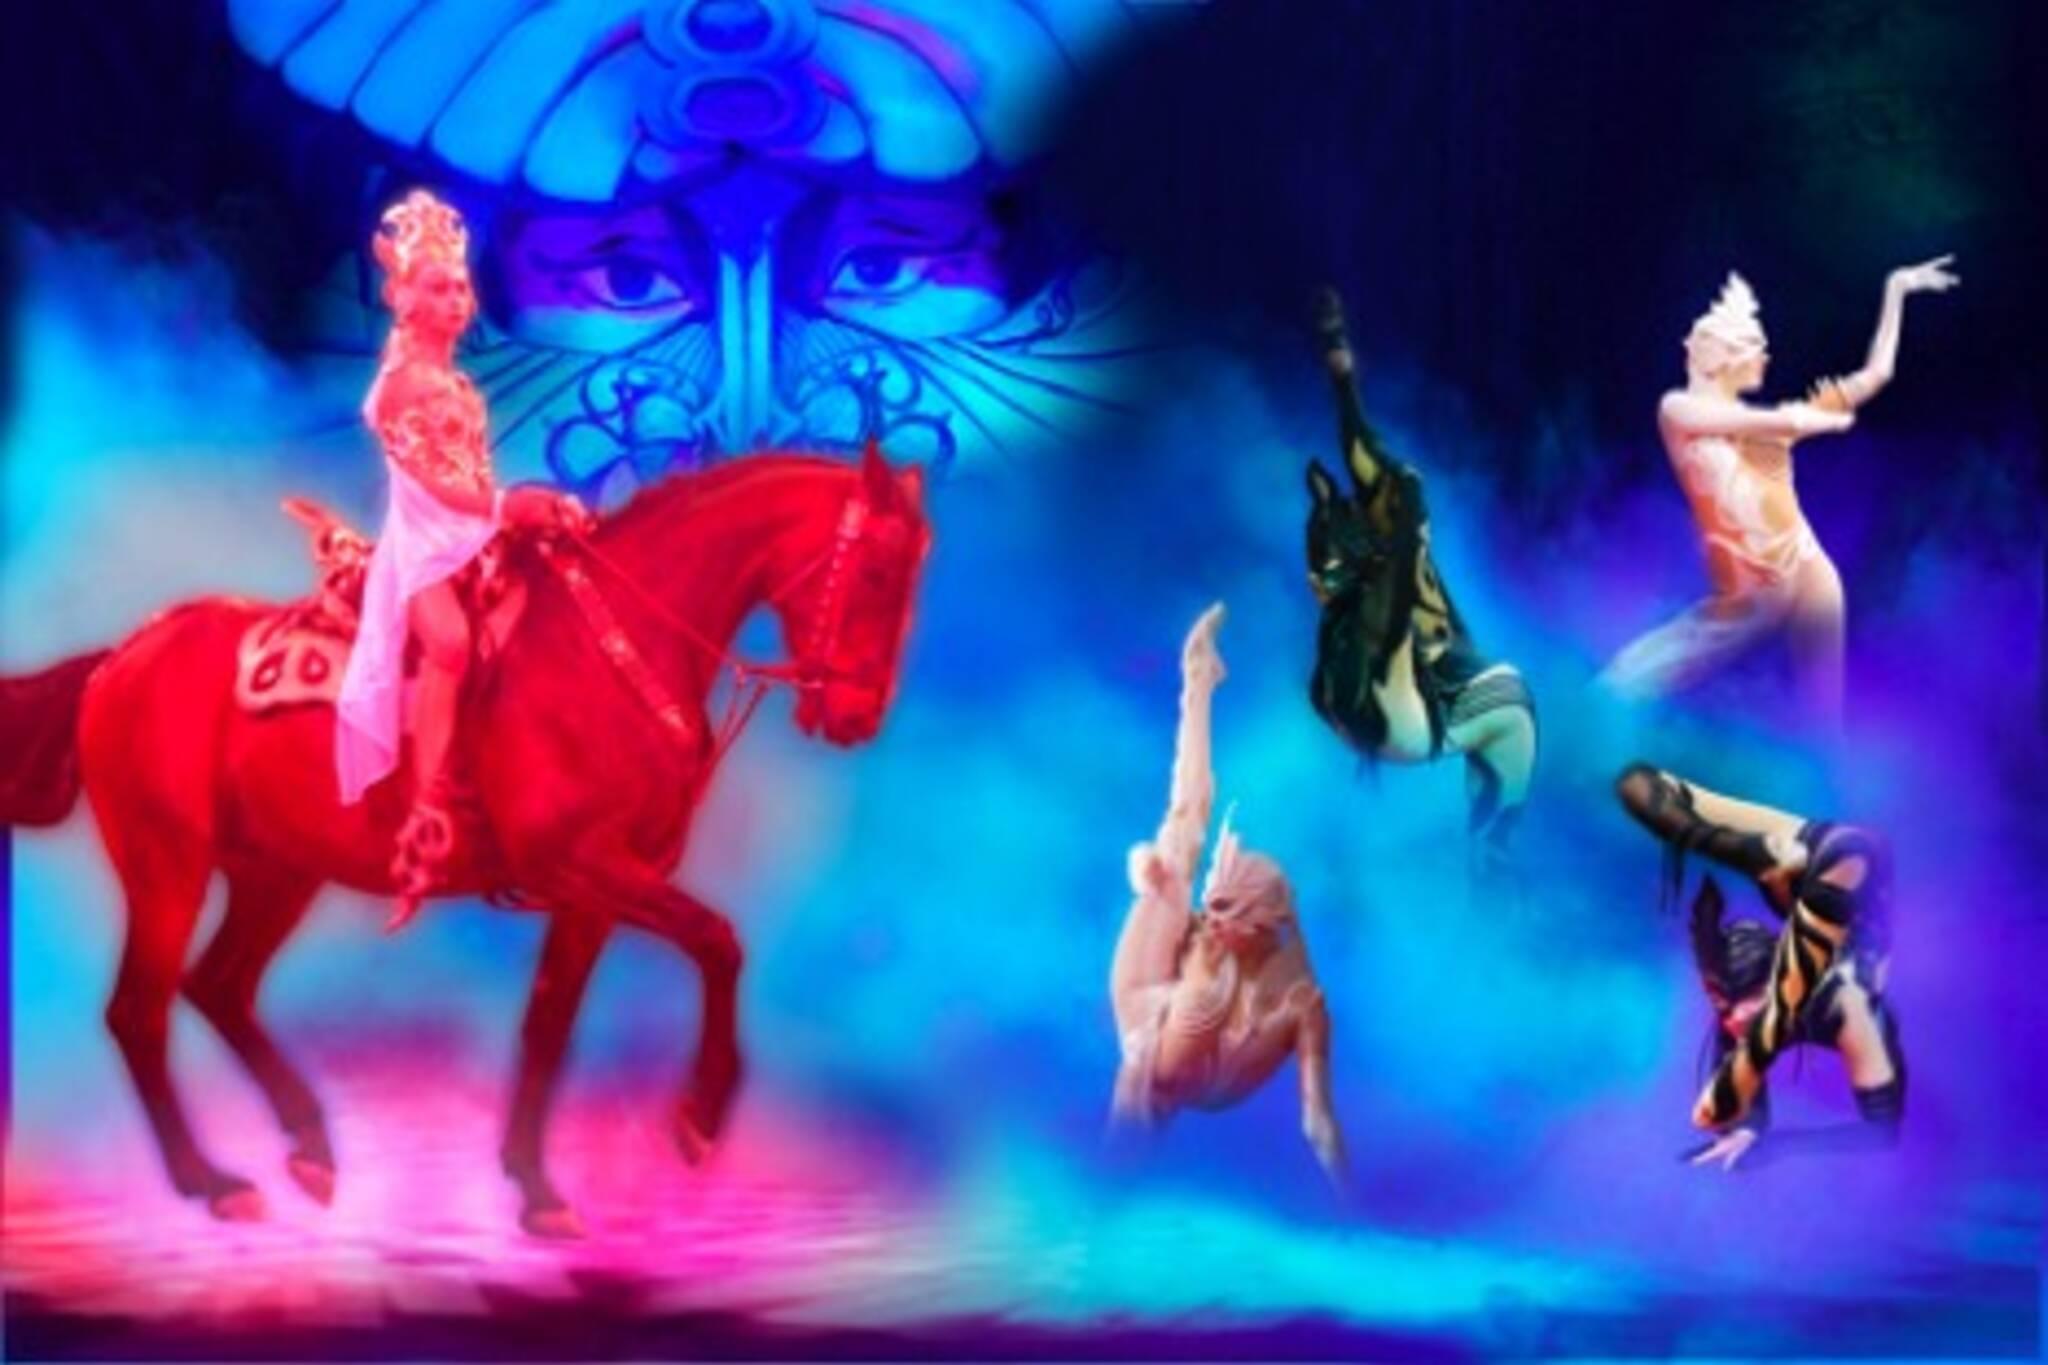 Cirque Niagara's Avaia Rides at Woodbine